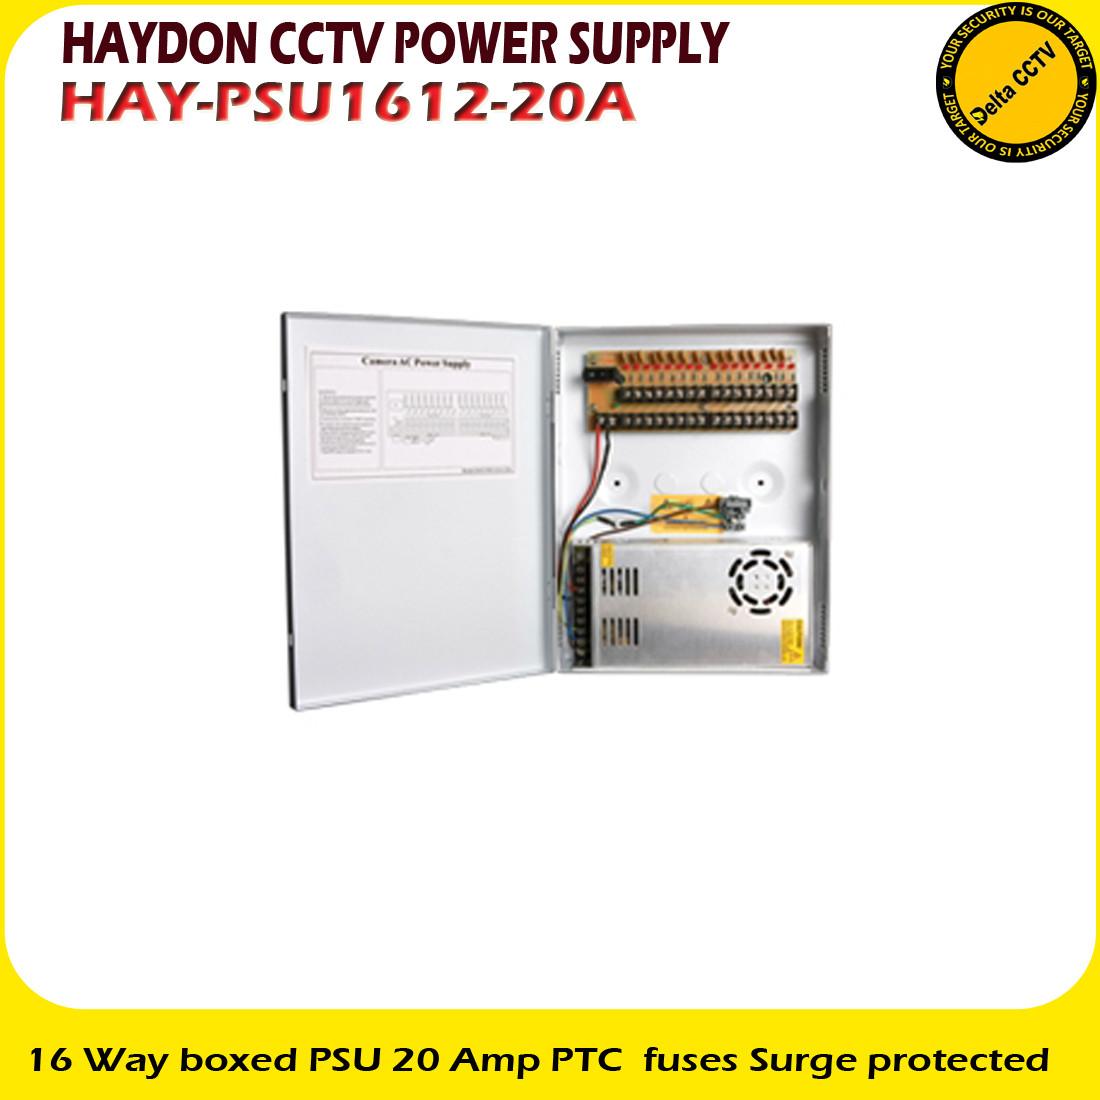 Haydon 16 Way Boxed PSU 20 Amp PTC Fuses Surge